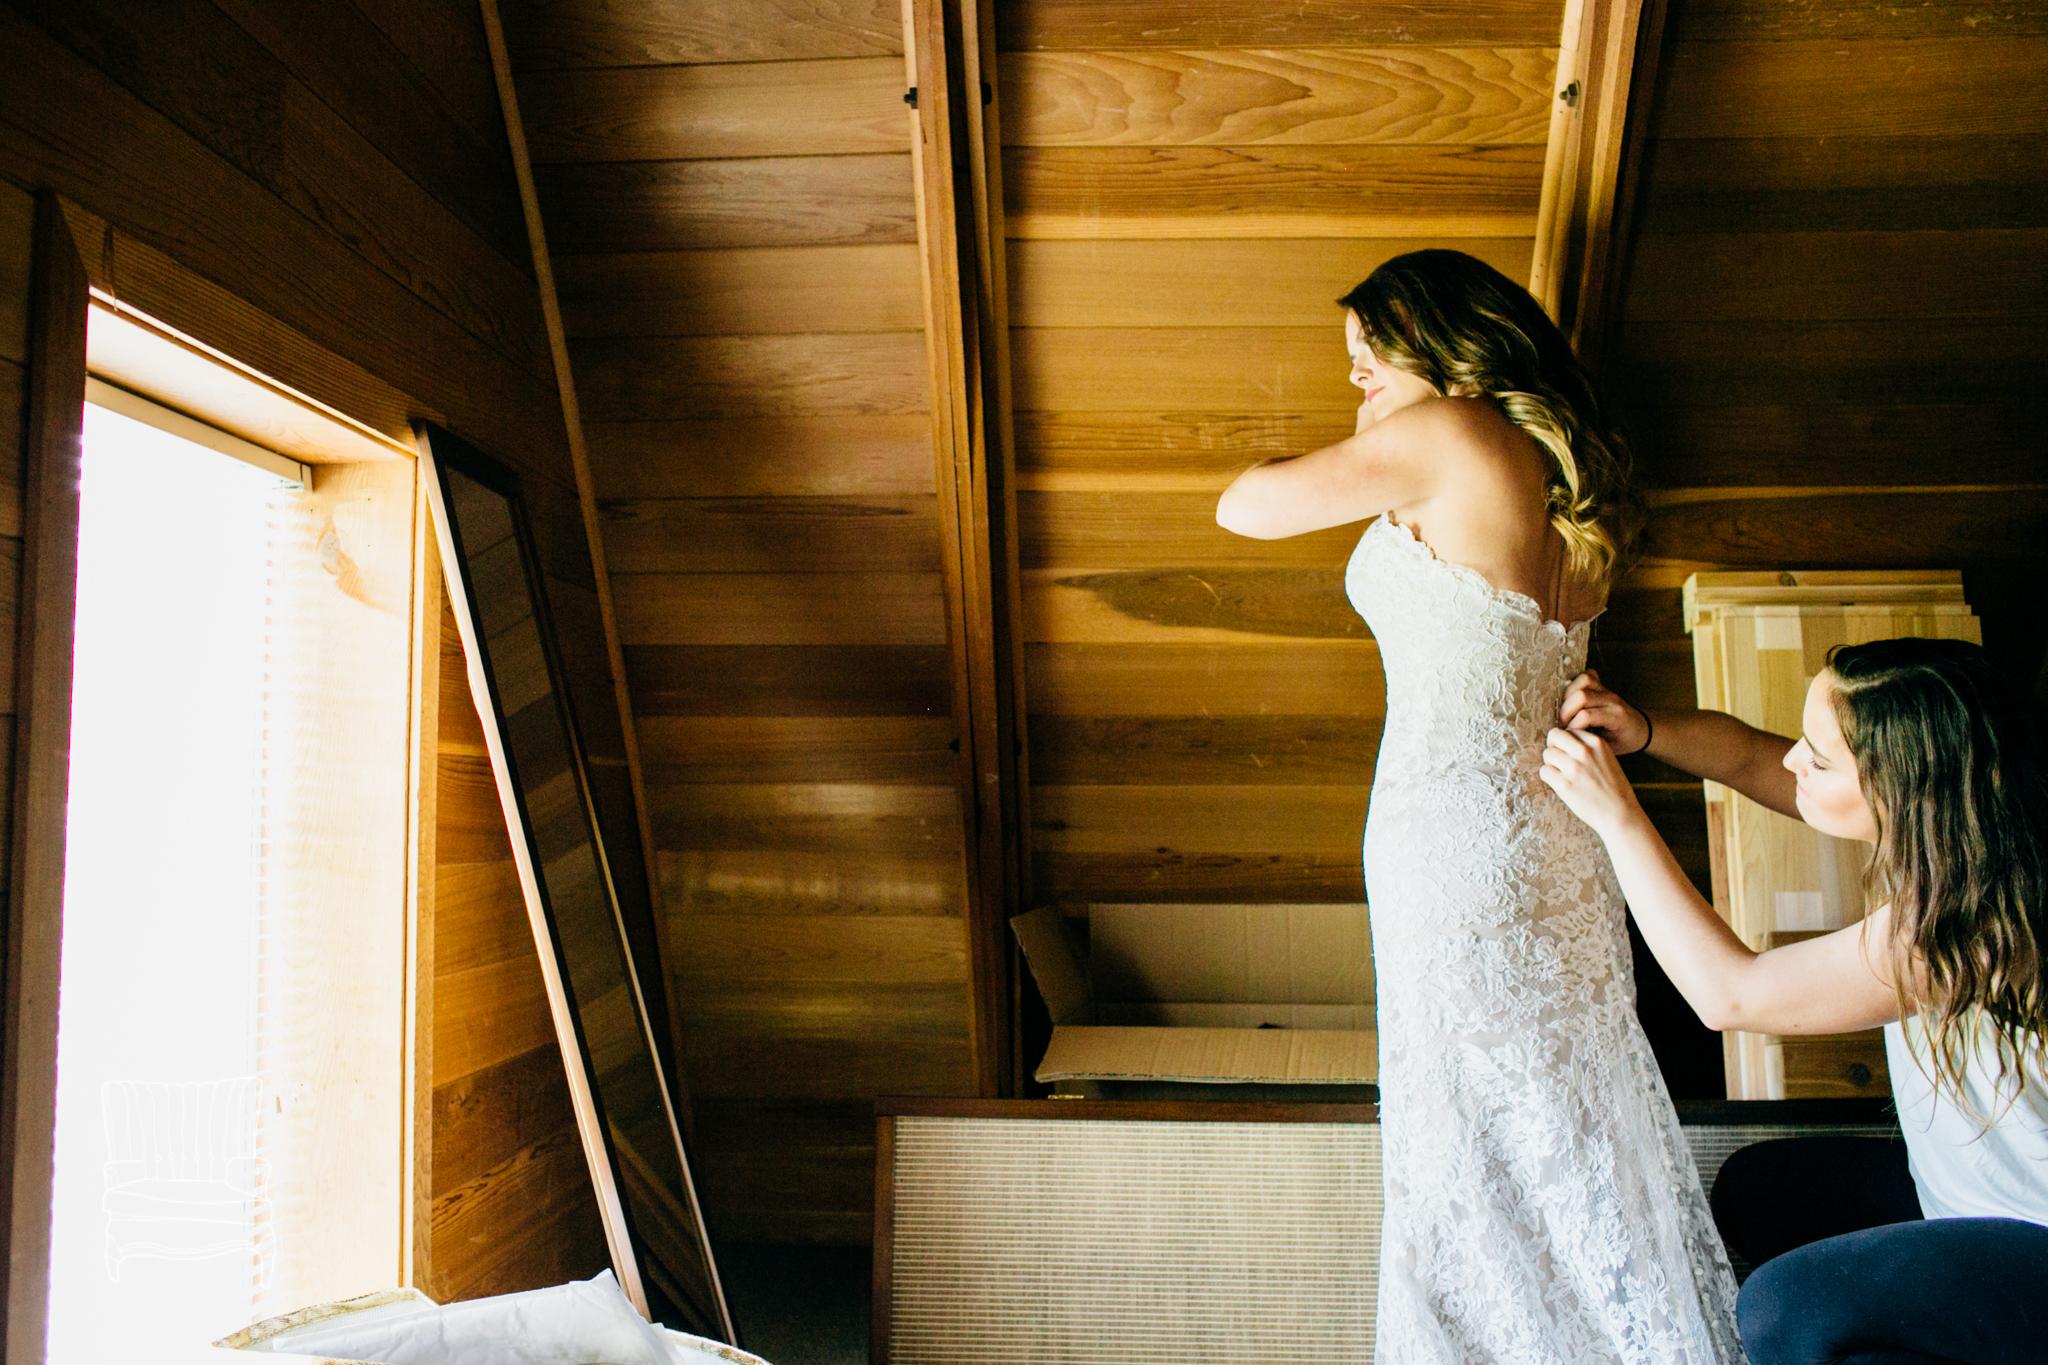 seattle-wedding-photographer-katheryn-moran-russells-bothell-wilkins-wedding-photo-10.jpg